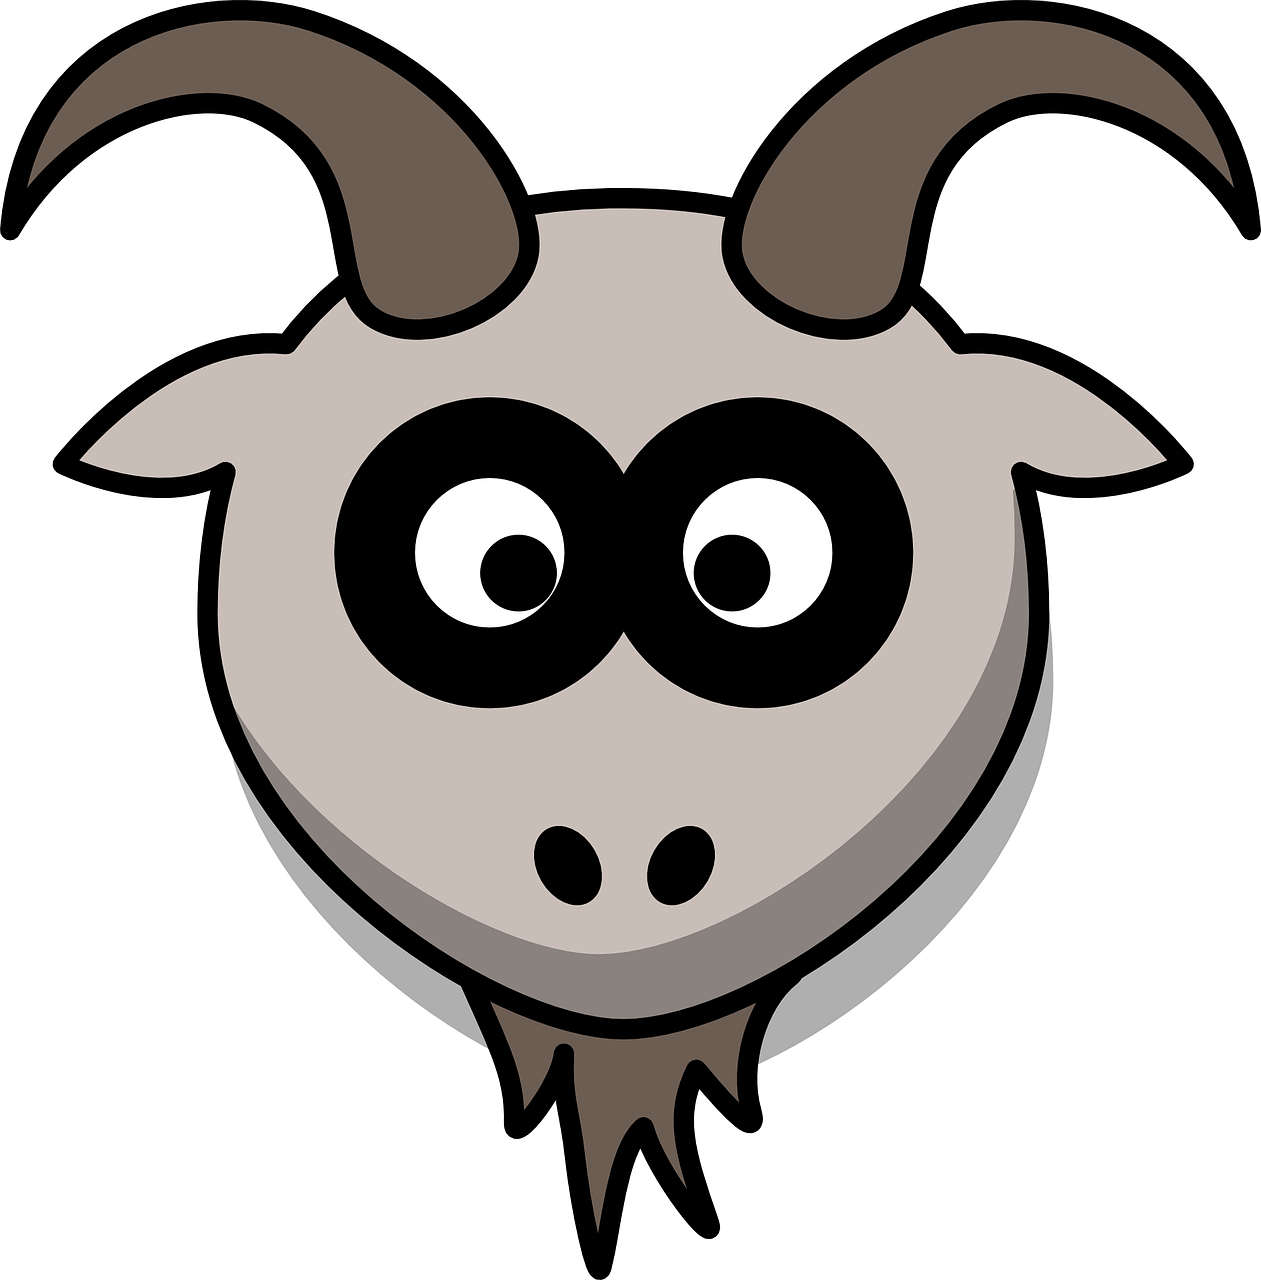 Clipart milk goat milk. Soap ziigie com click